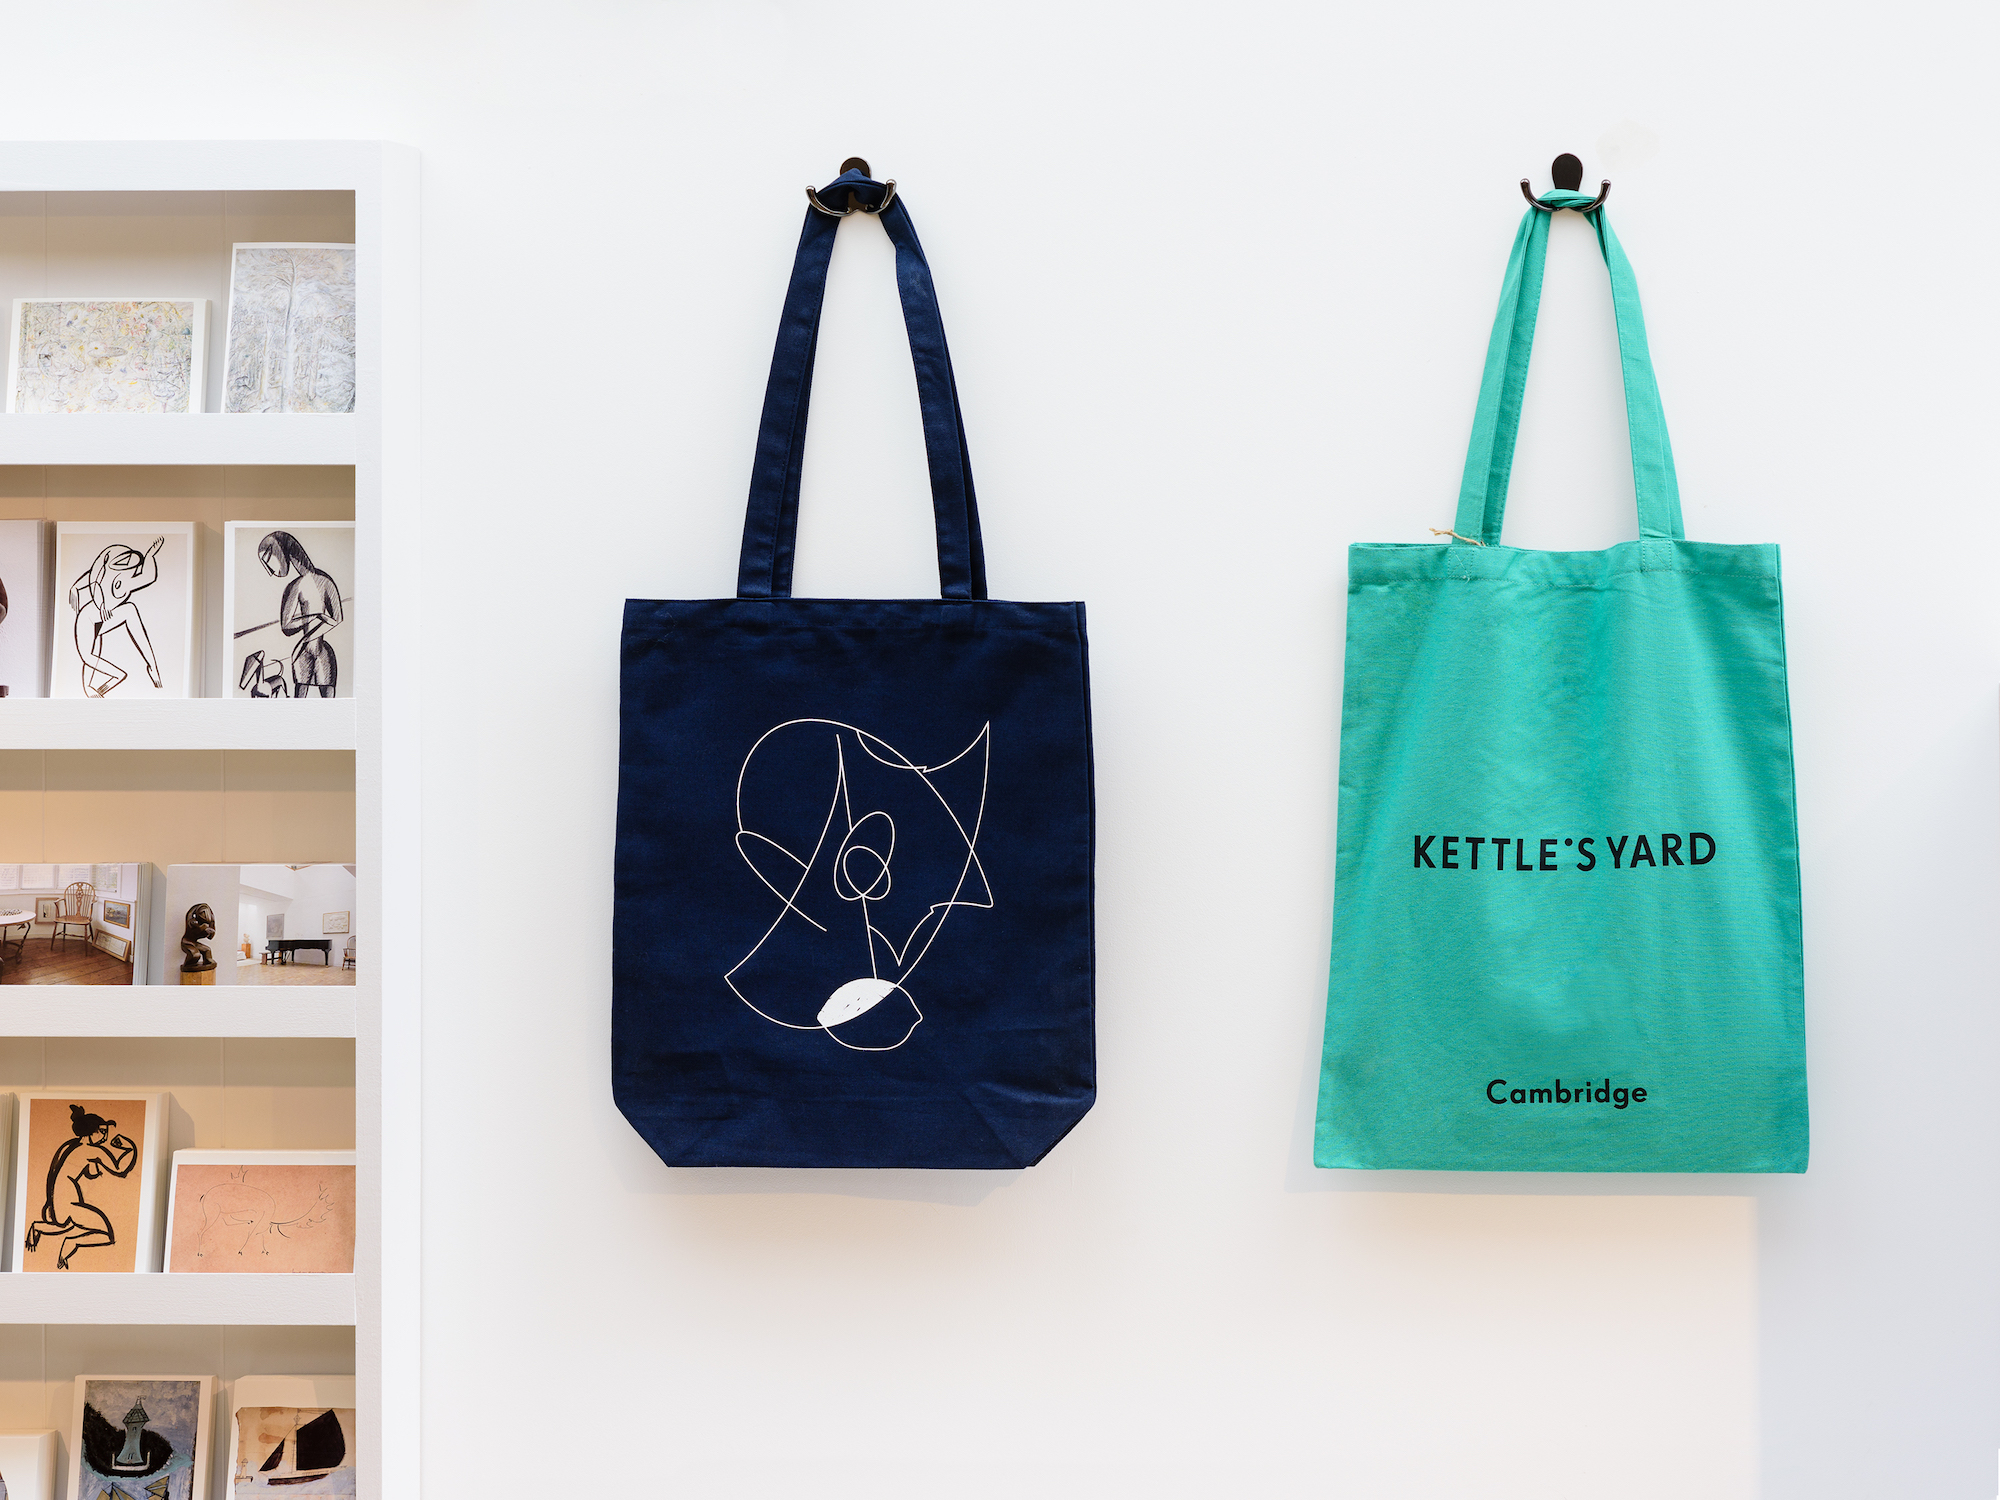 Kettle's Yard tote bag design by APFEL